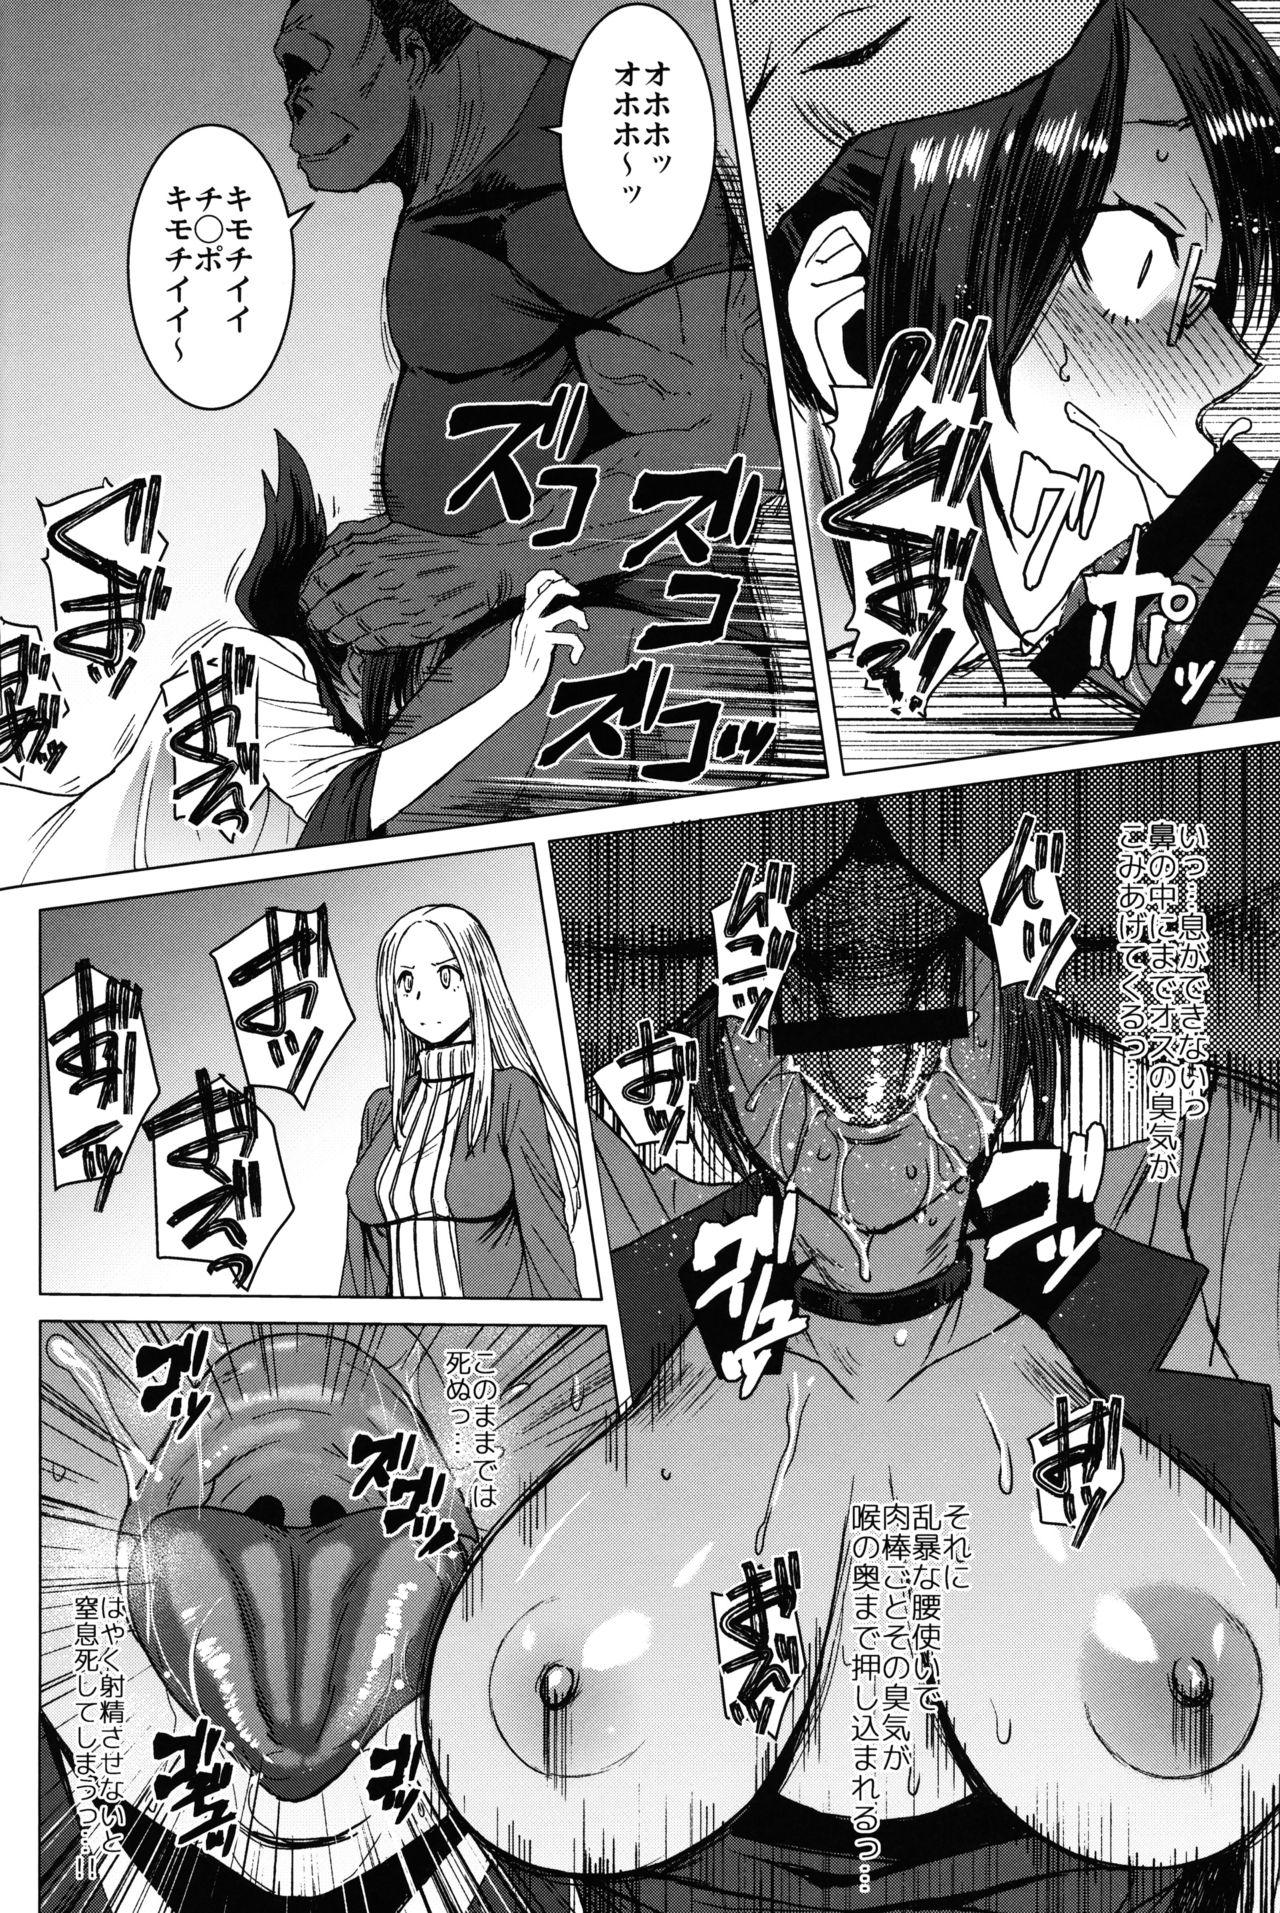 Youkoso Kokujin Koubi Beya e final discipline 10